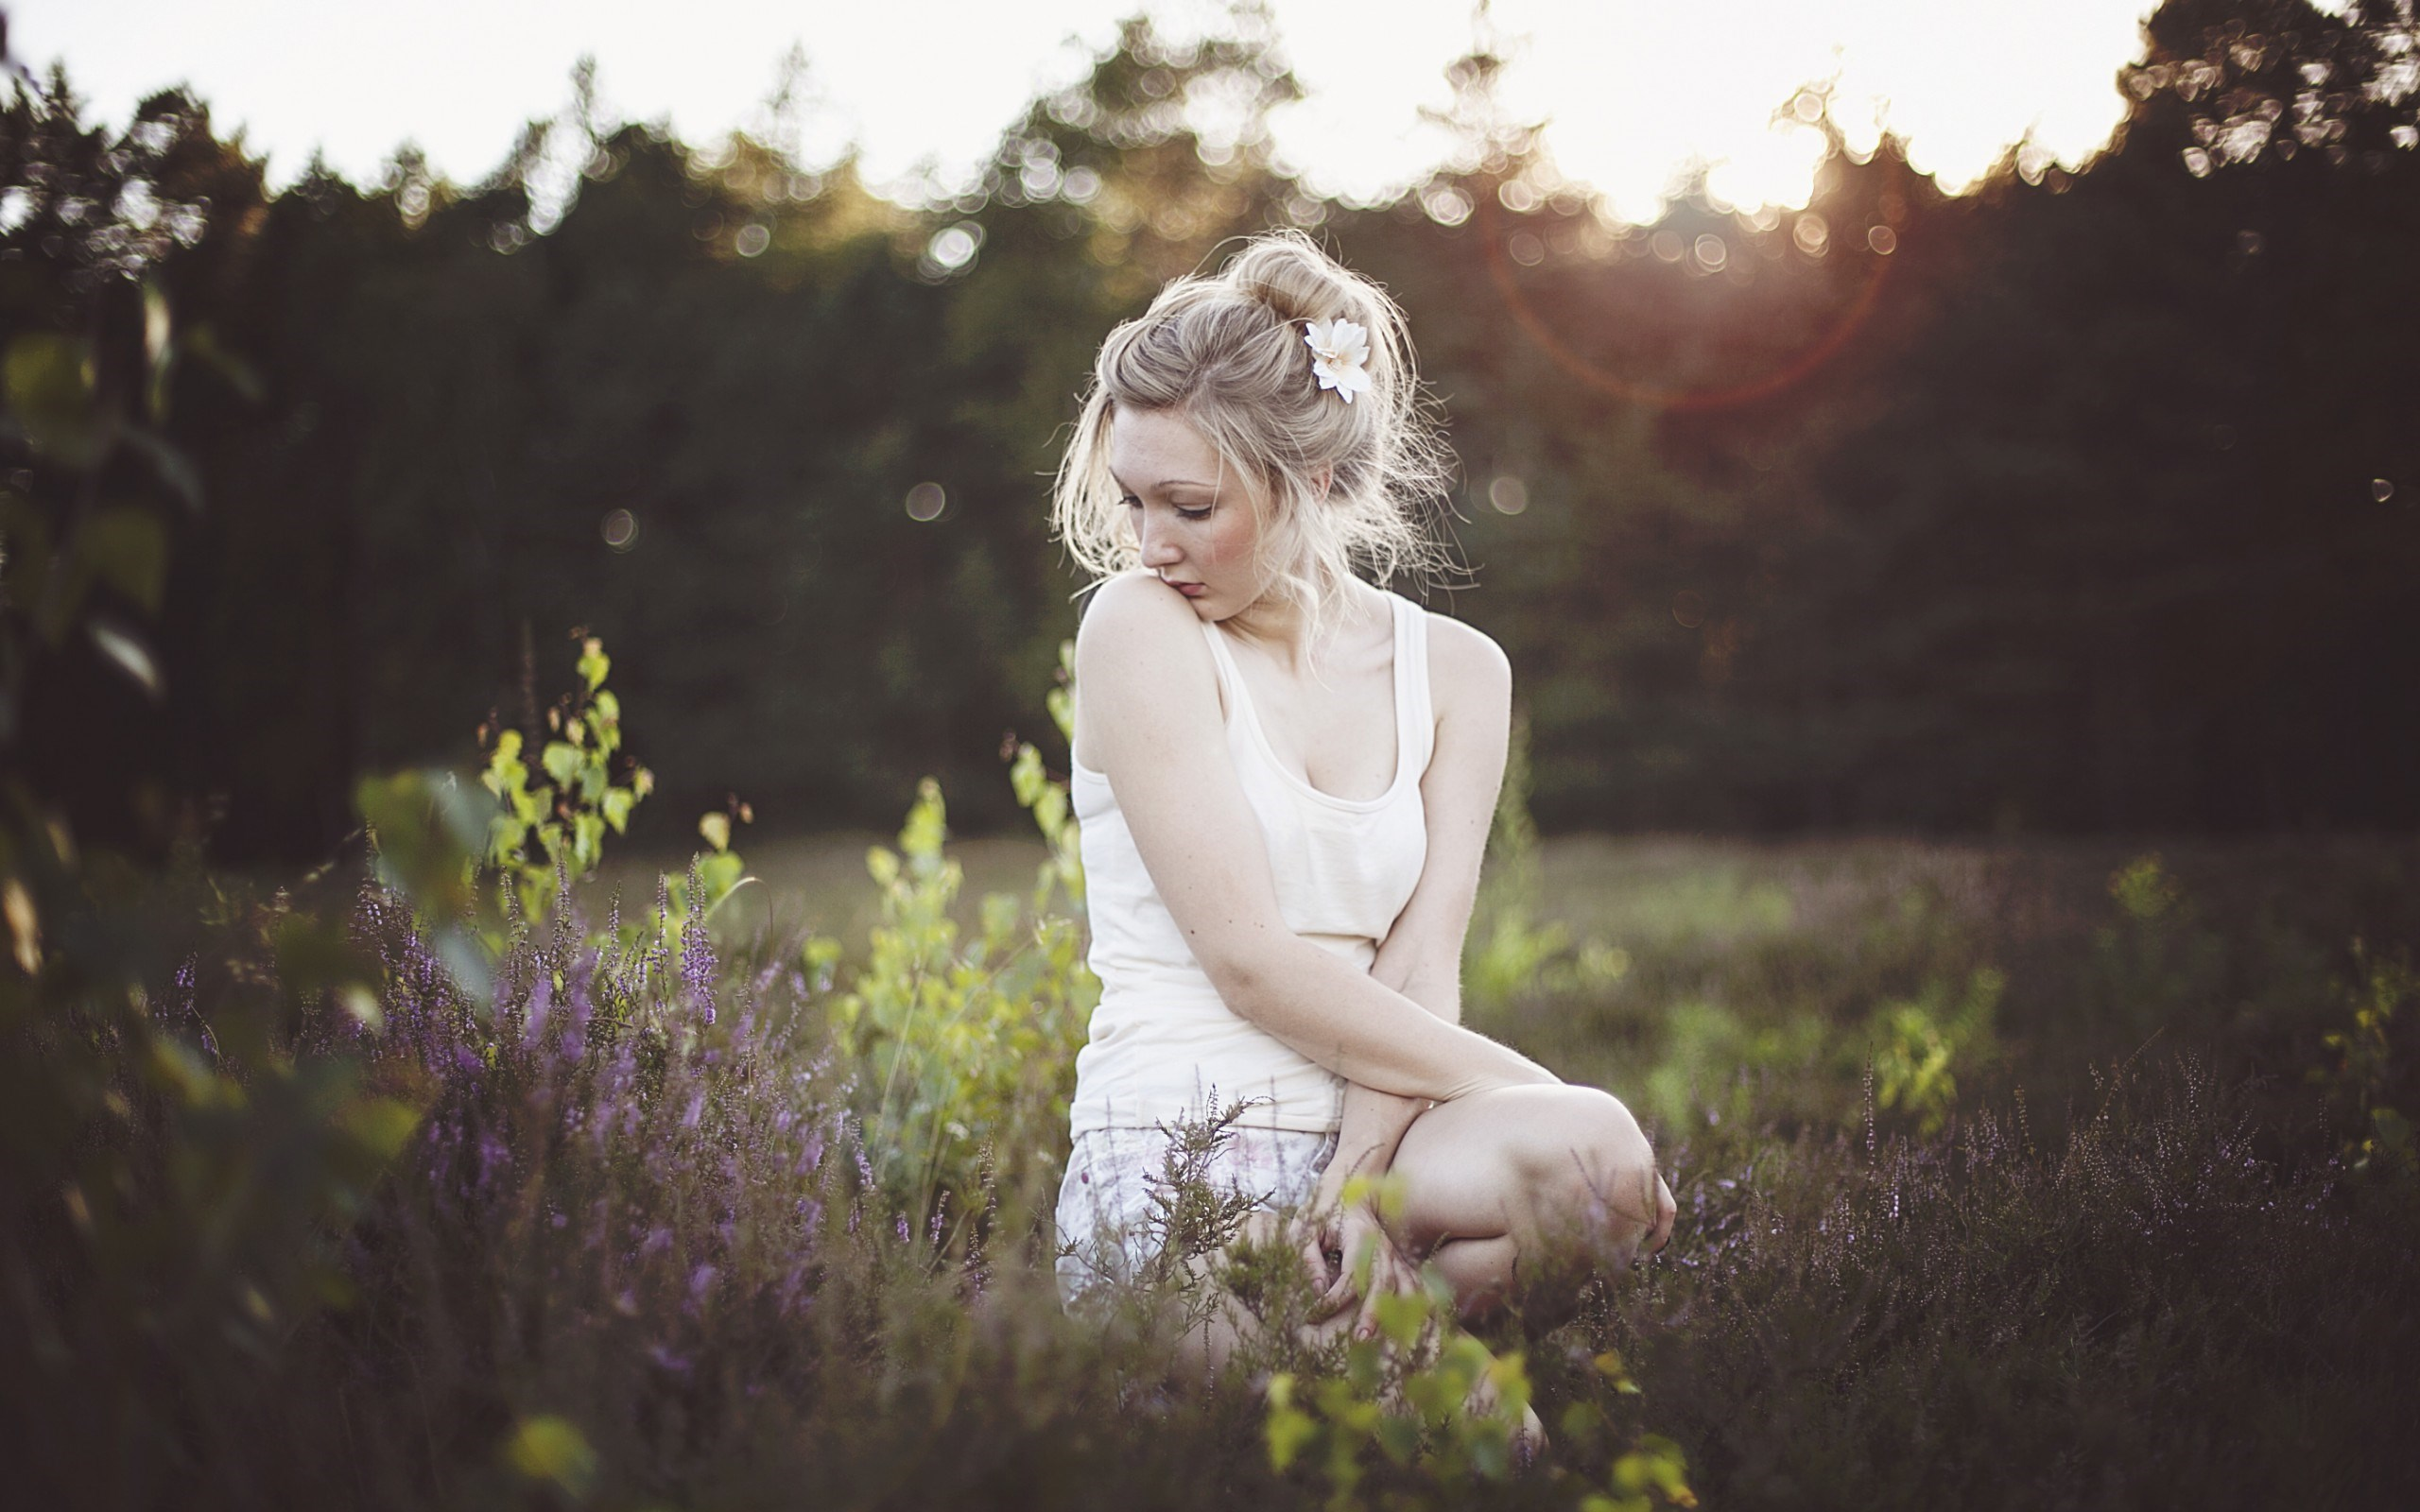 Girl Blonde Flowers Morning Meadow Grass